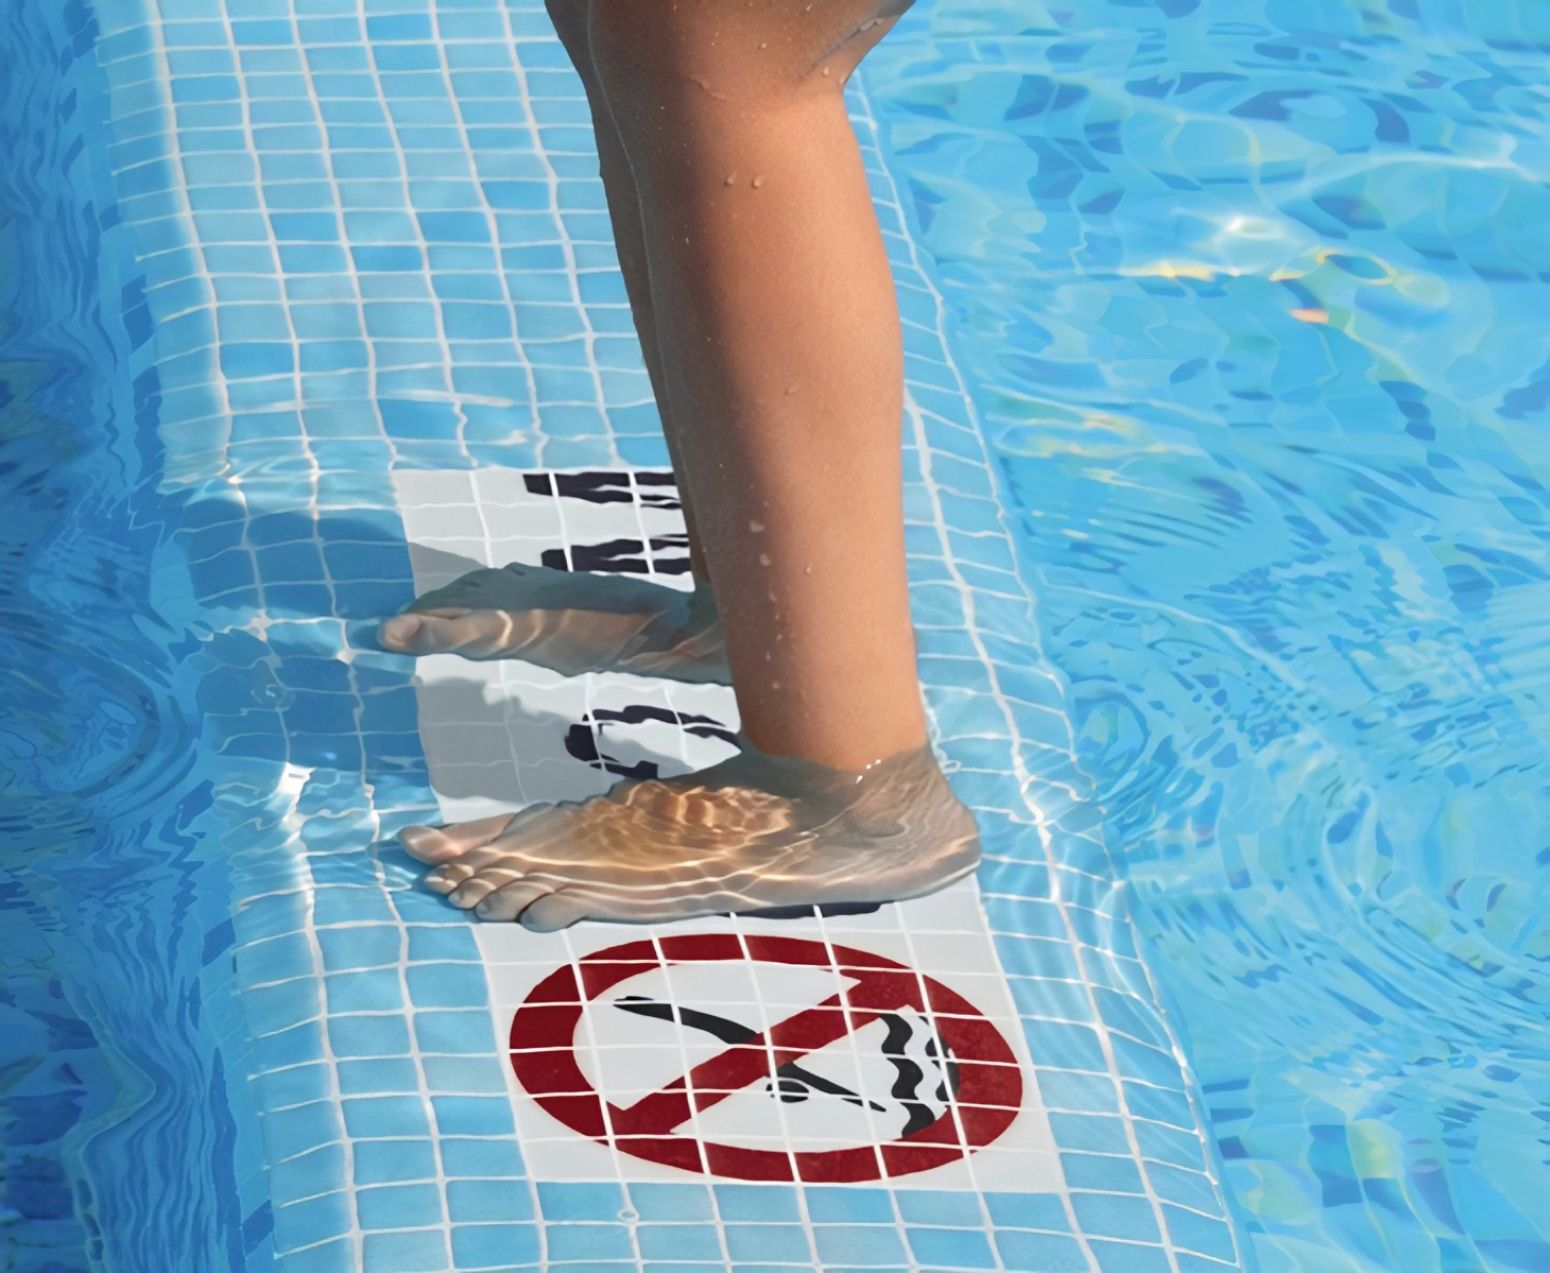 Proyecto-hisbalit-3s safe swim signs-